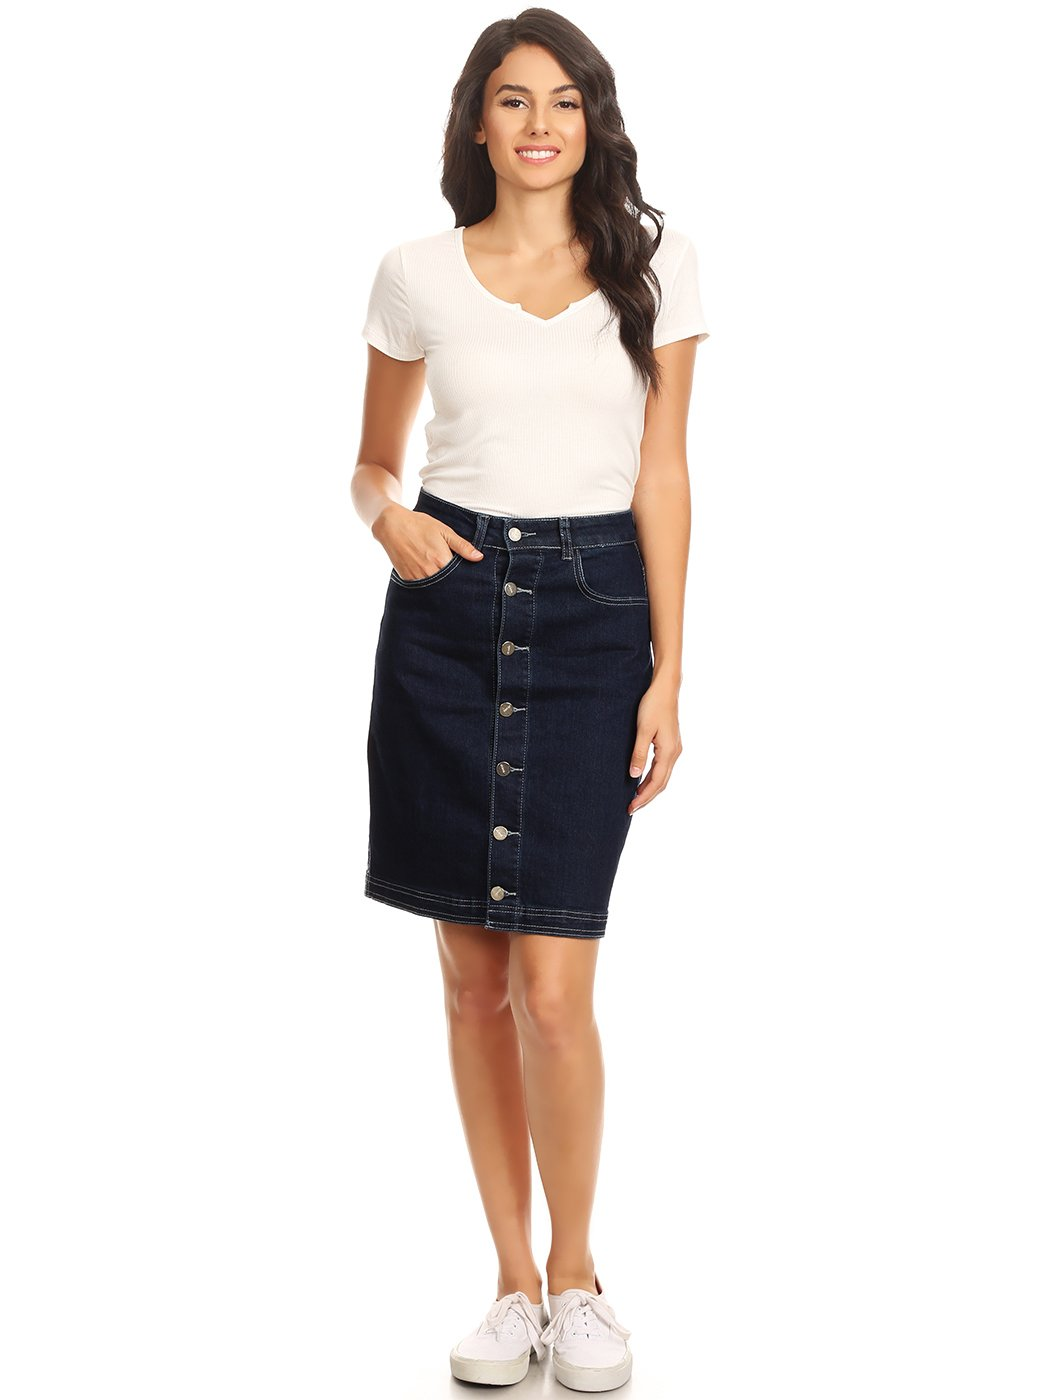 Anna-Kaci Womens Vintage Stretch Denim Jean Button Flare Skirt with Side Pocket, Indigo, Medium